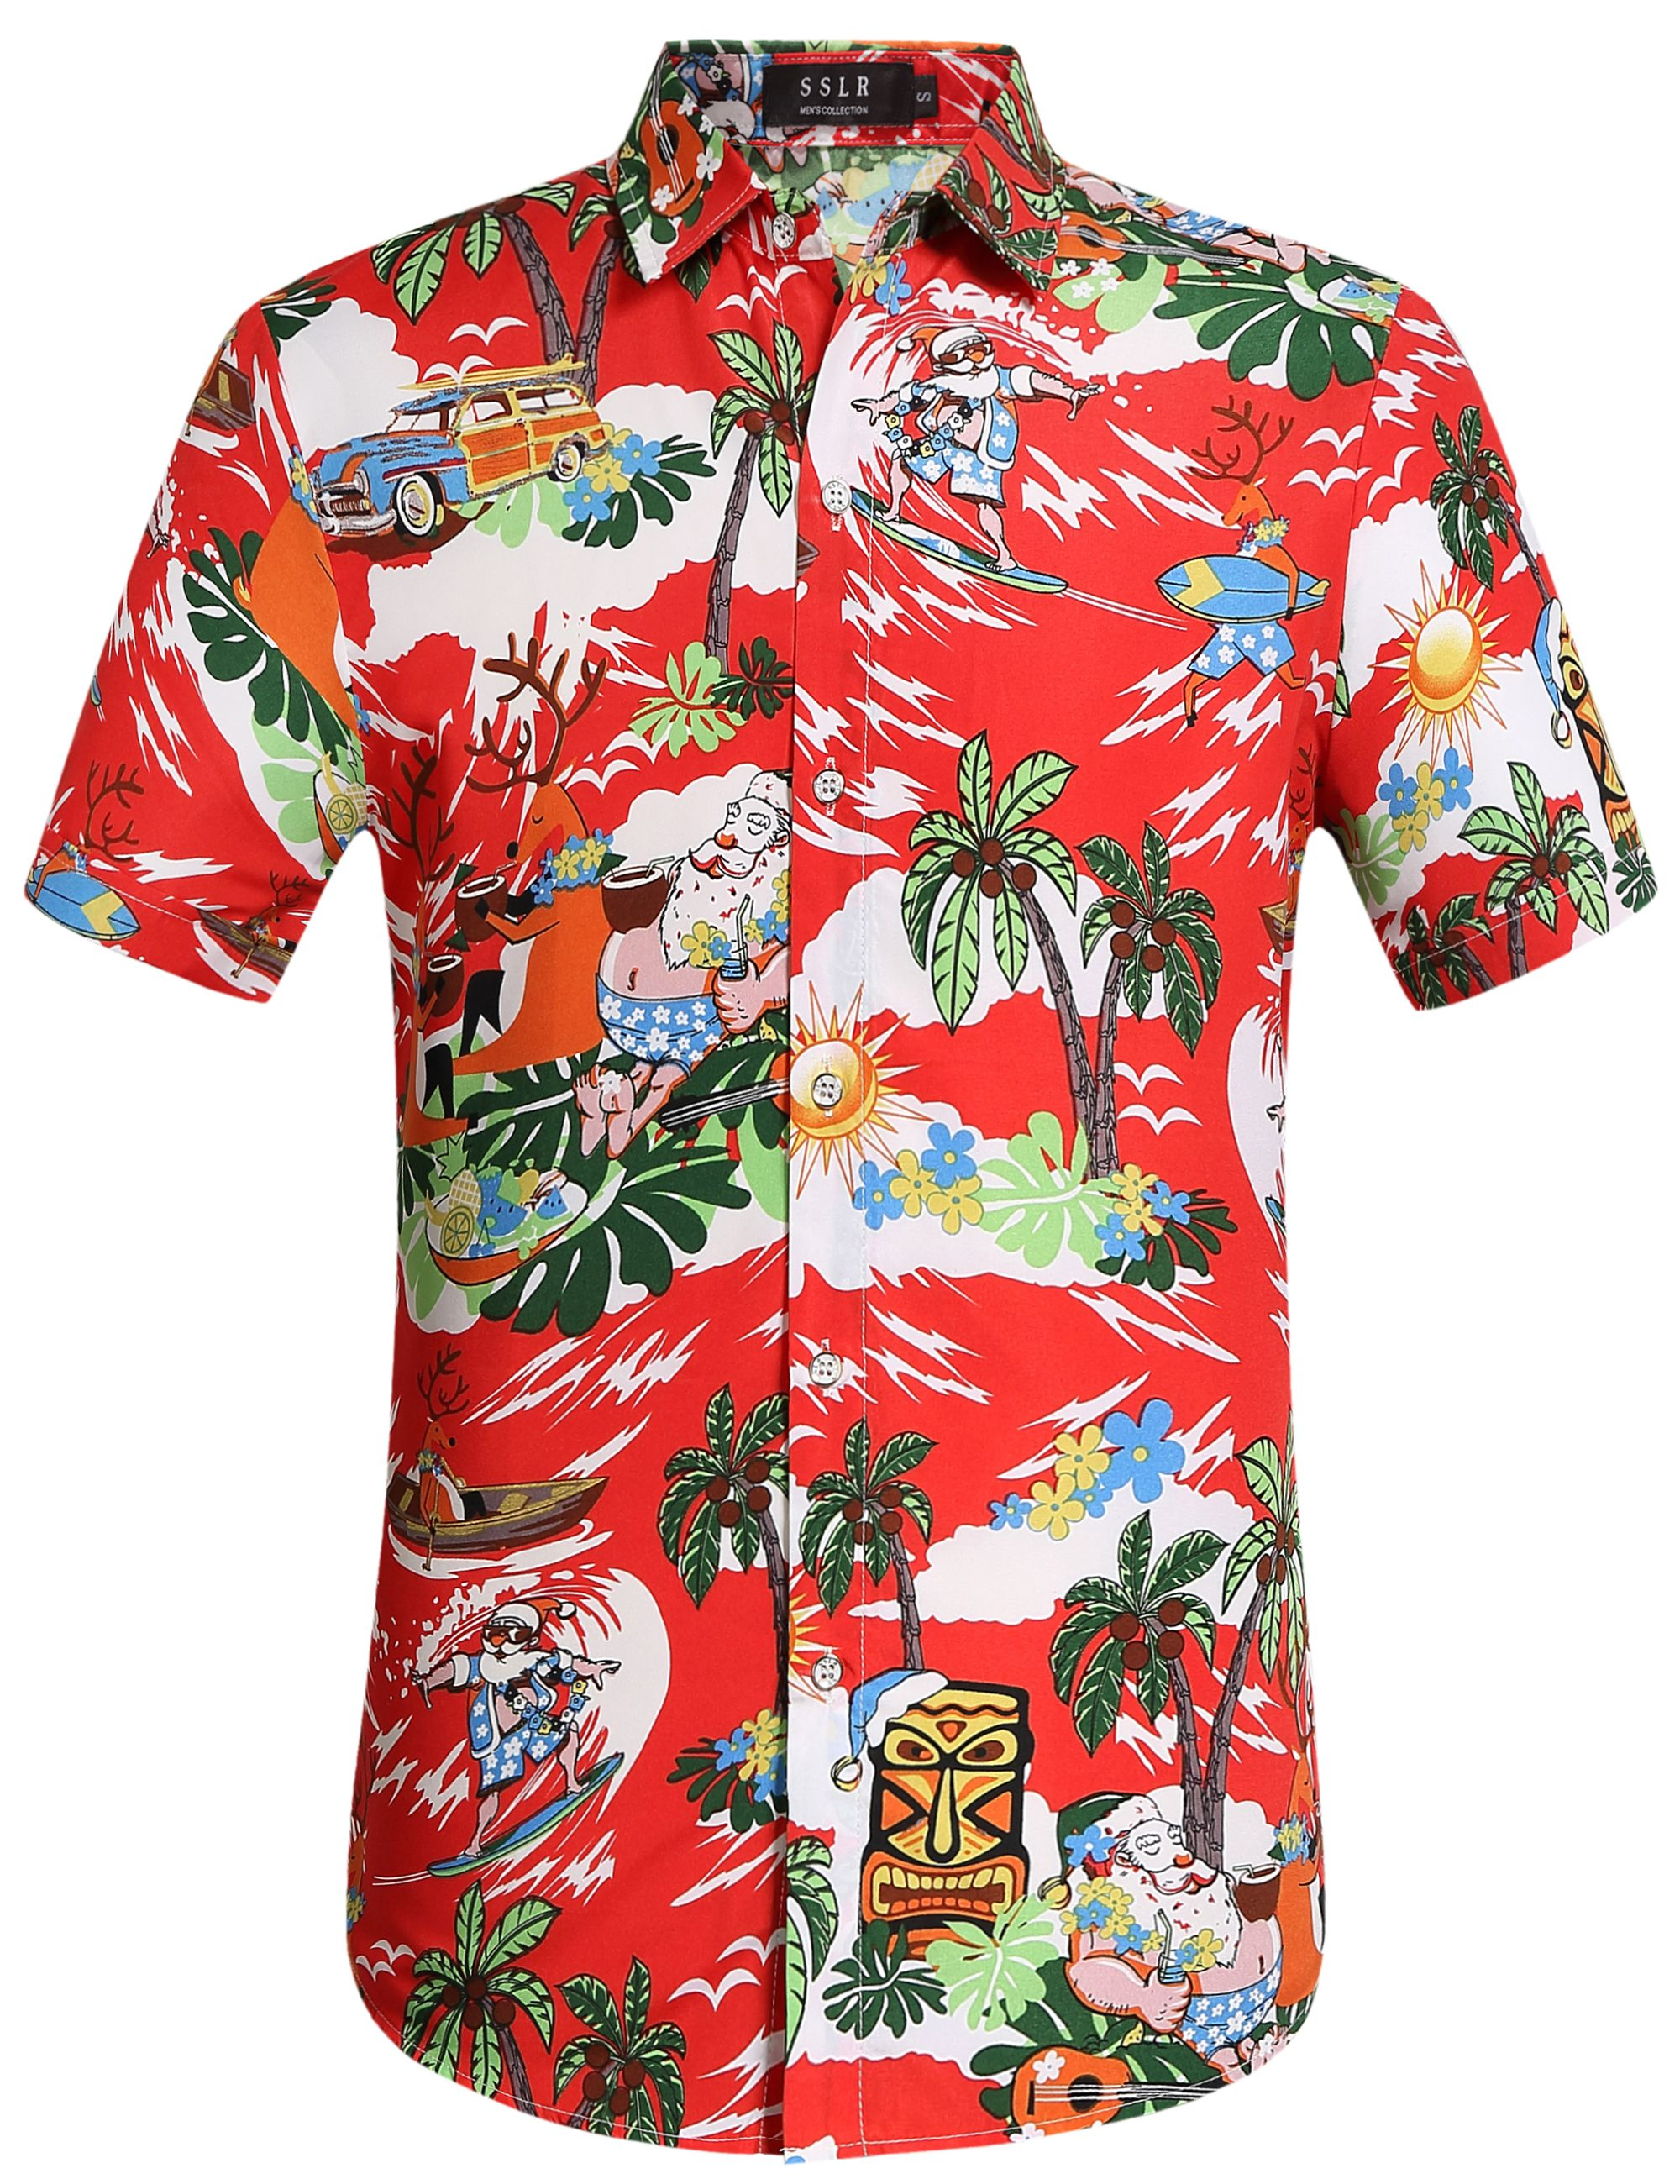 7ae062a4 SSLR Men's Christmas Santa Claus Party Casual Tropical Hawaiian Shirt